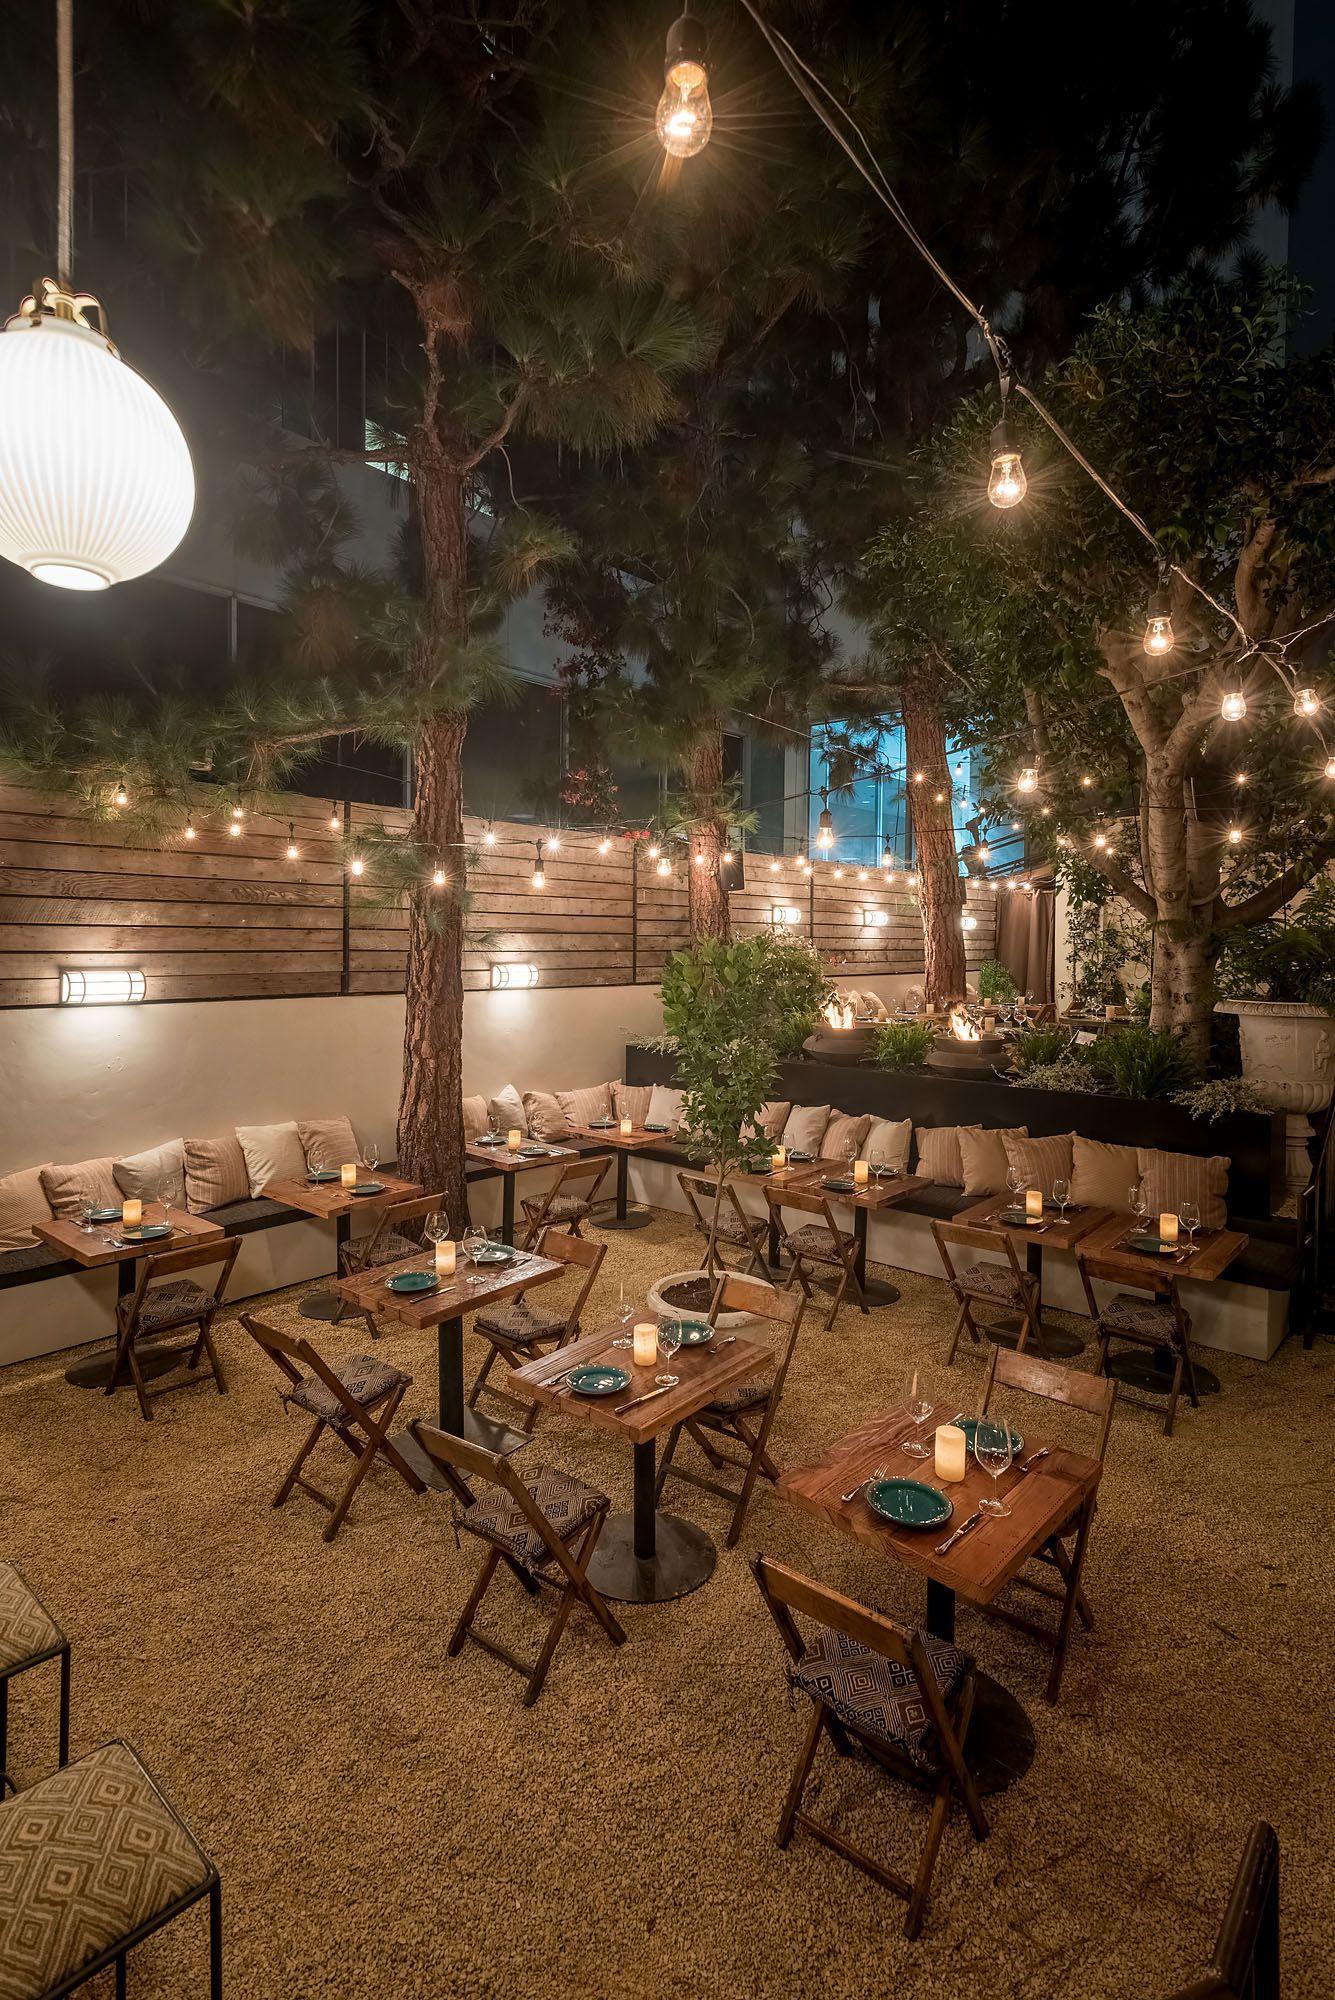 Santa Monica S New Patio Hideaway Feels Like A Celebrity Backyard Party Outdoor Restaurant Patio Outdoor Restaurant Backyard Restaurant